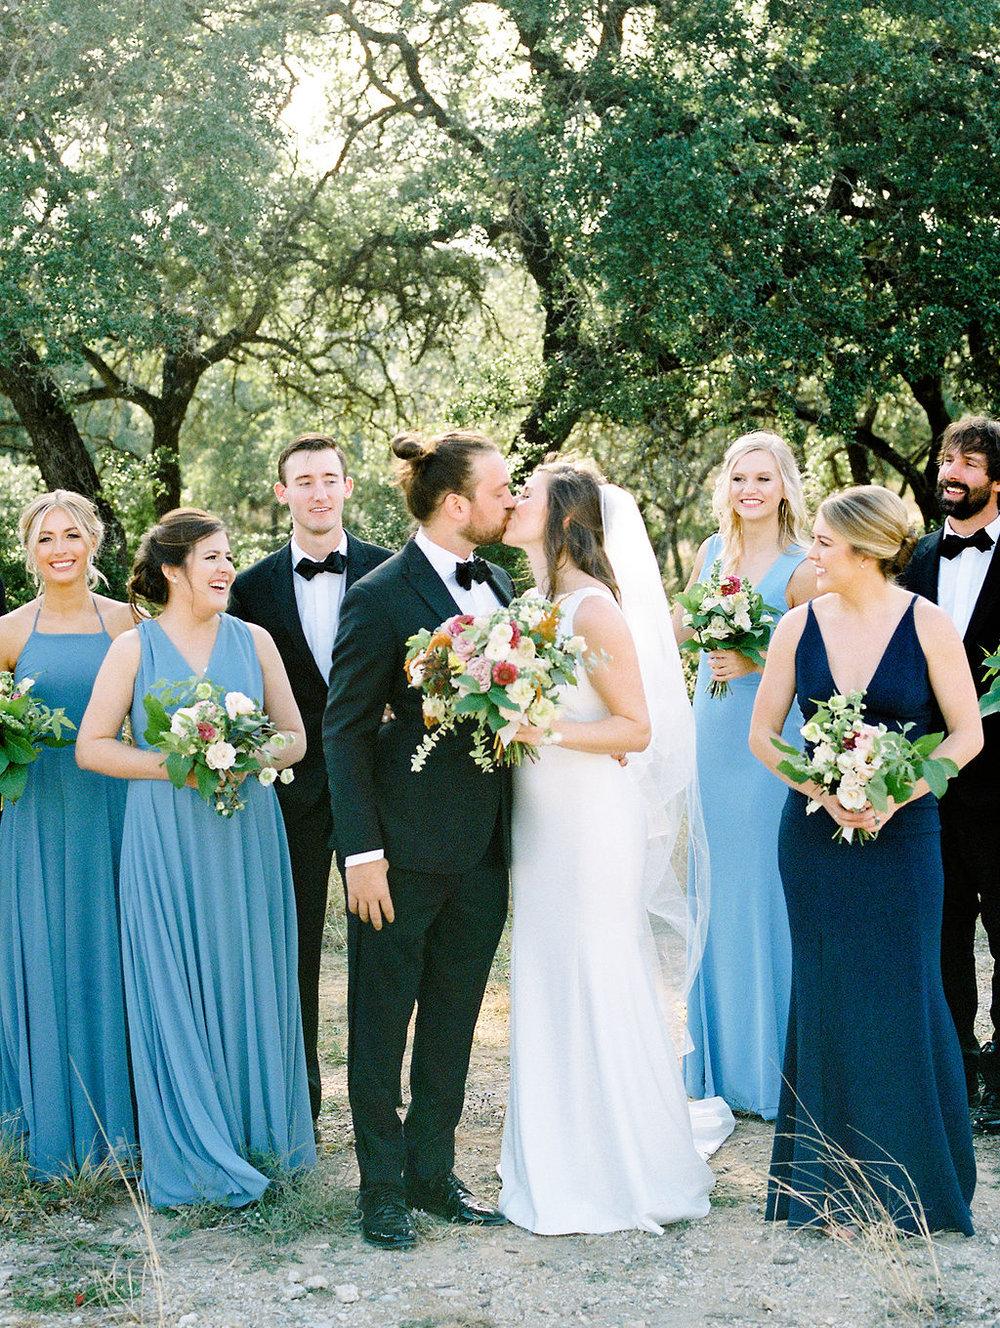 Austin-Texas-Wedding-Photographer-Addison-Grove-Film-67.jpg